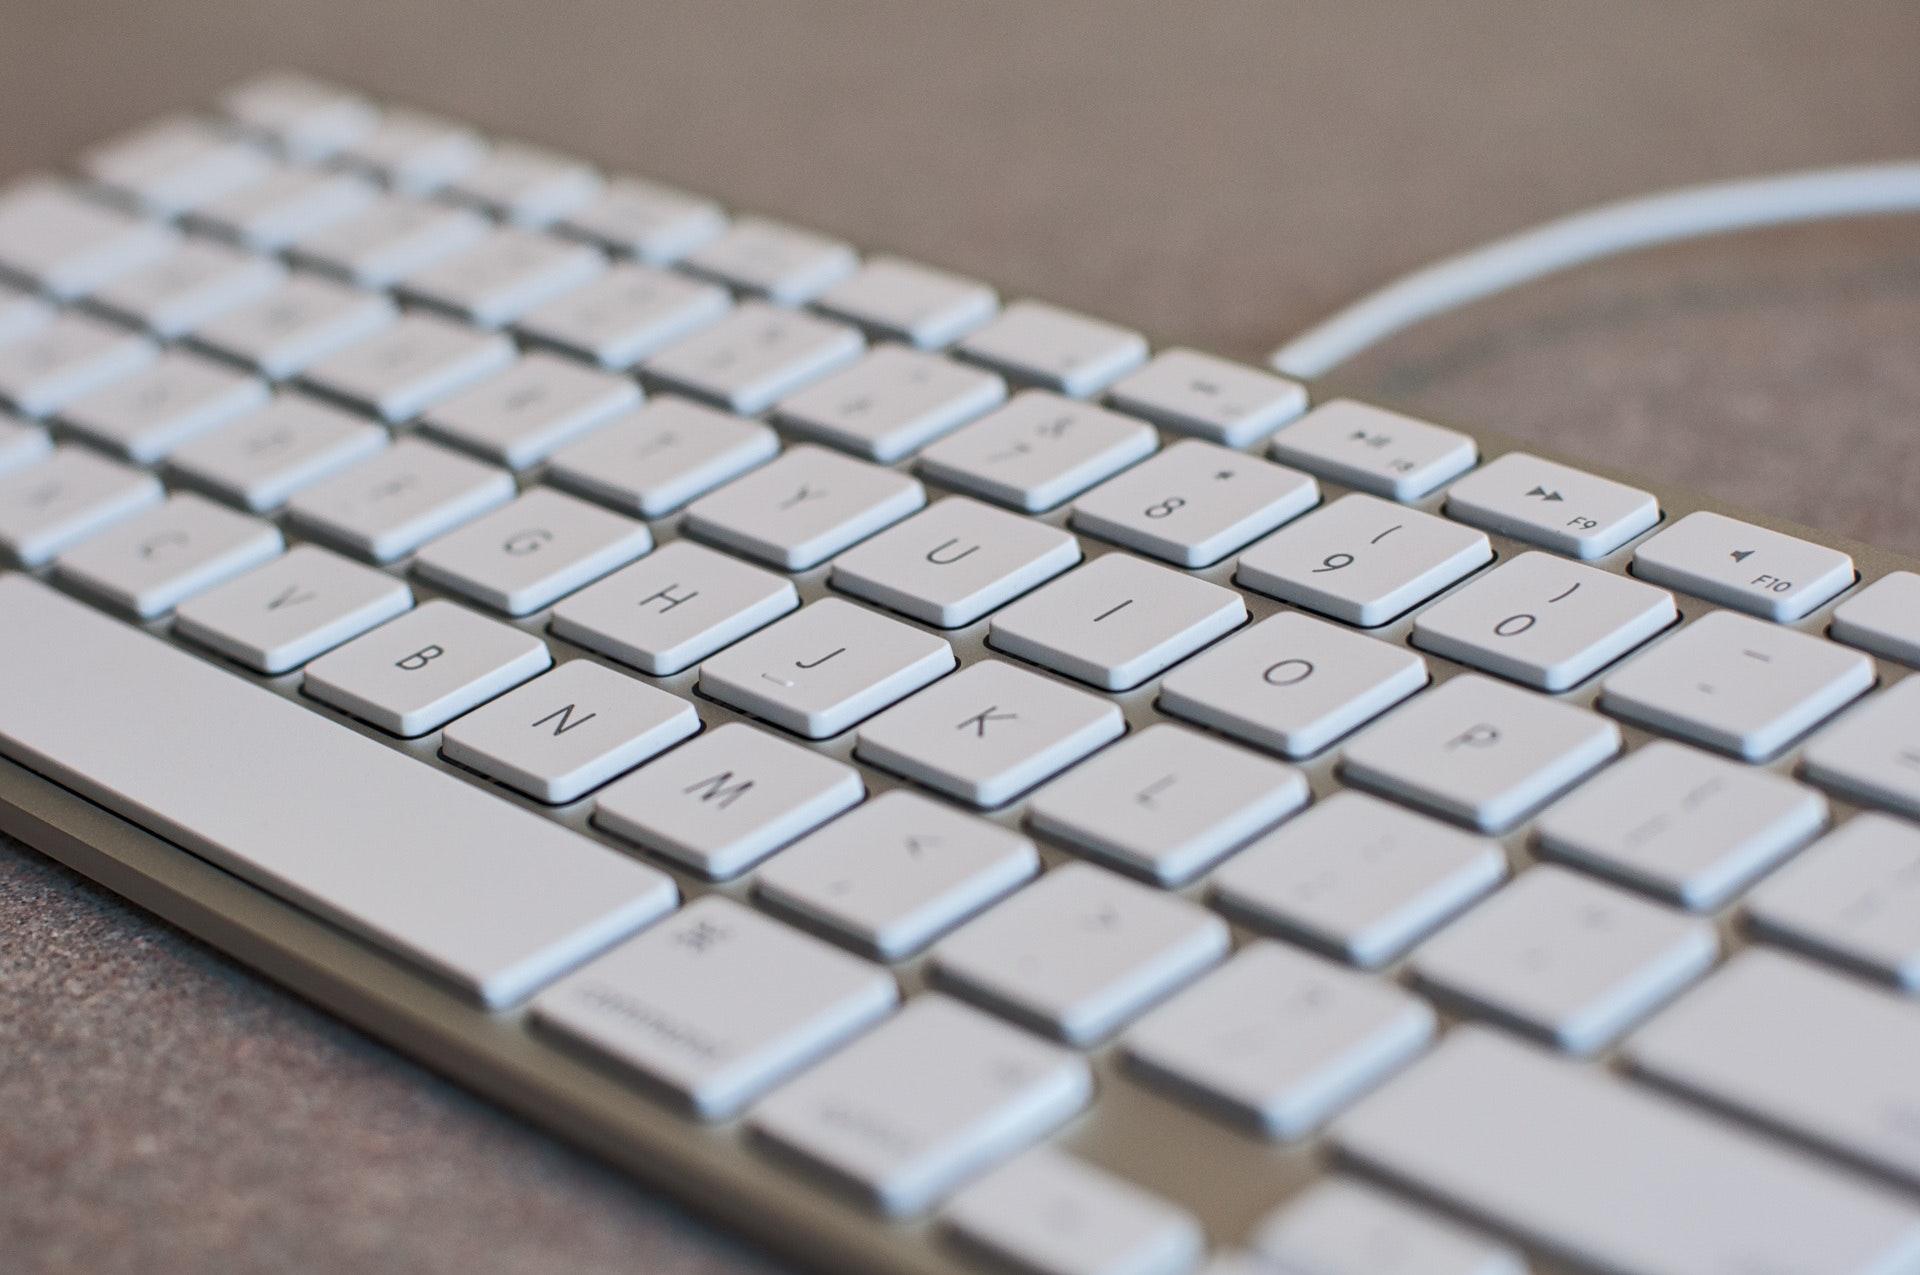 White Computer Keyboard, Modern, Table, Technology, Work, HQ Photo